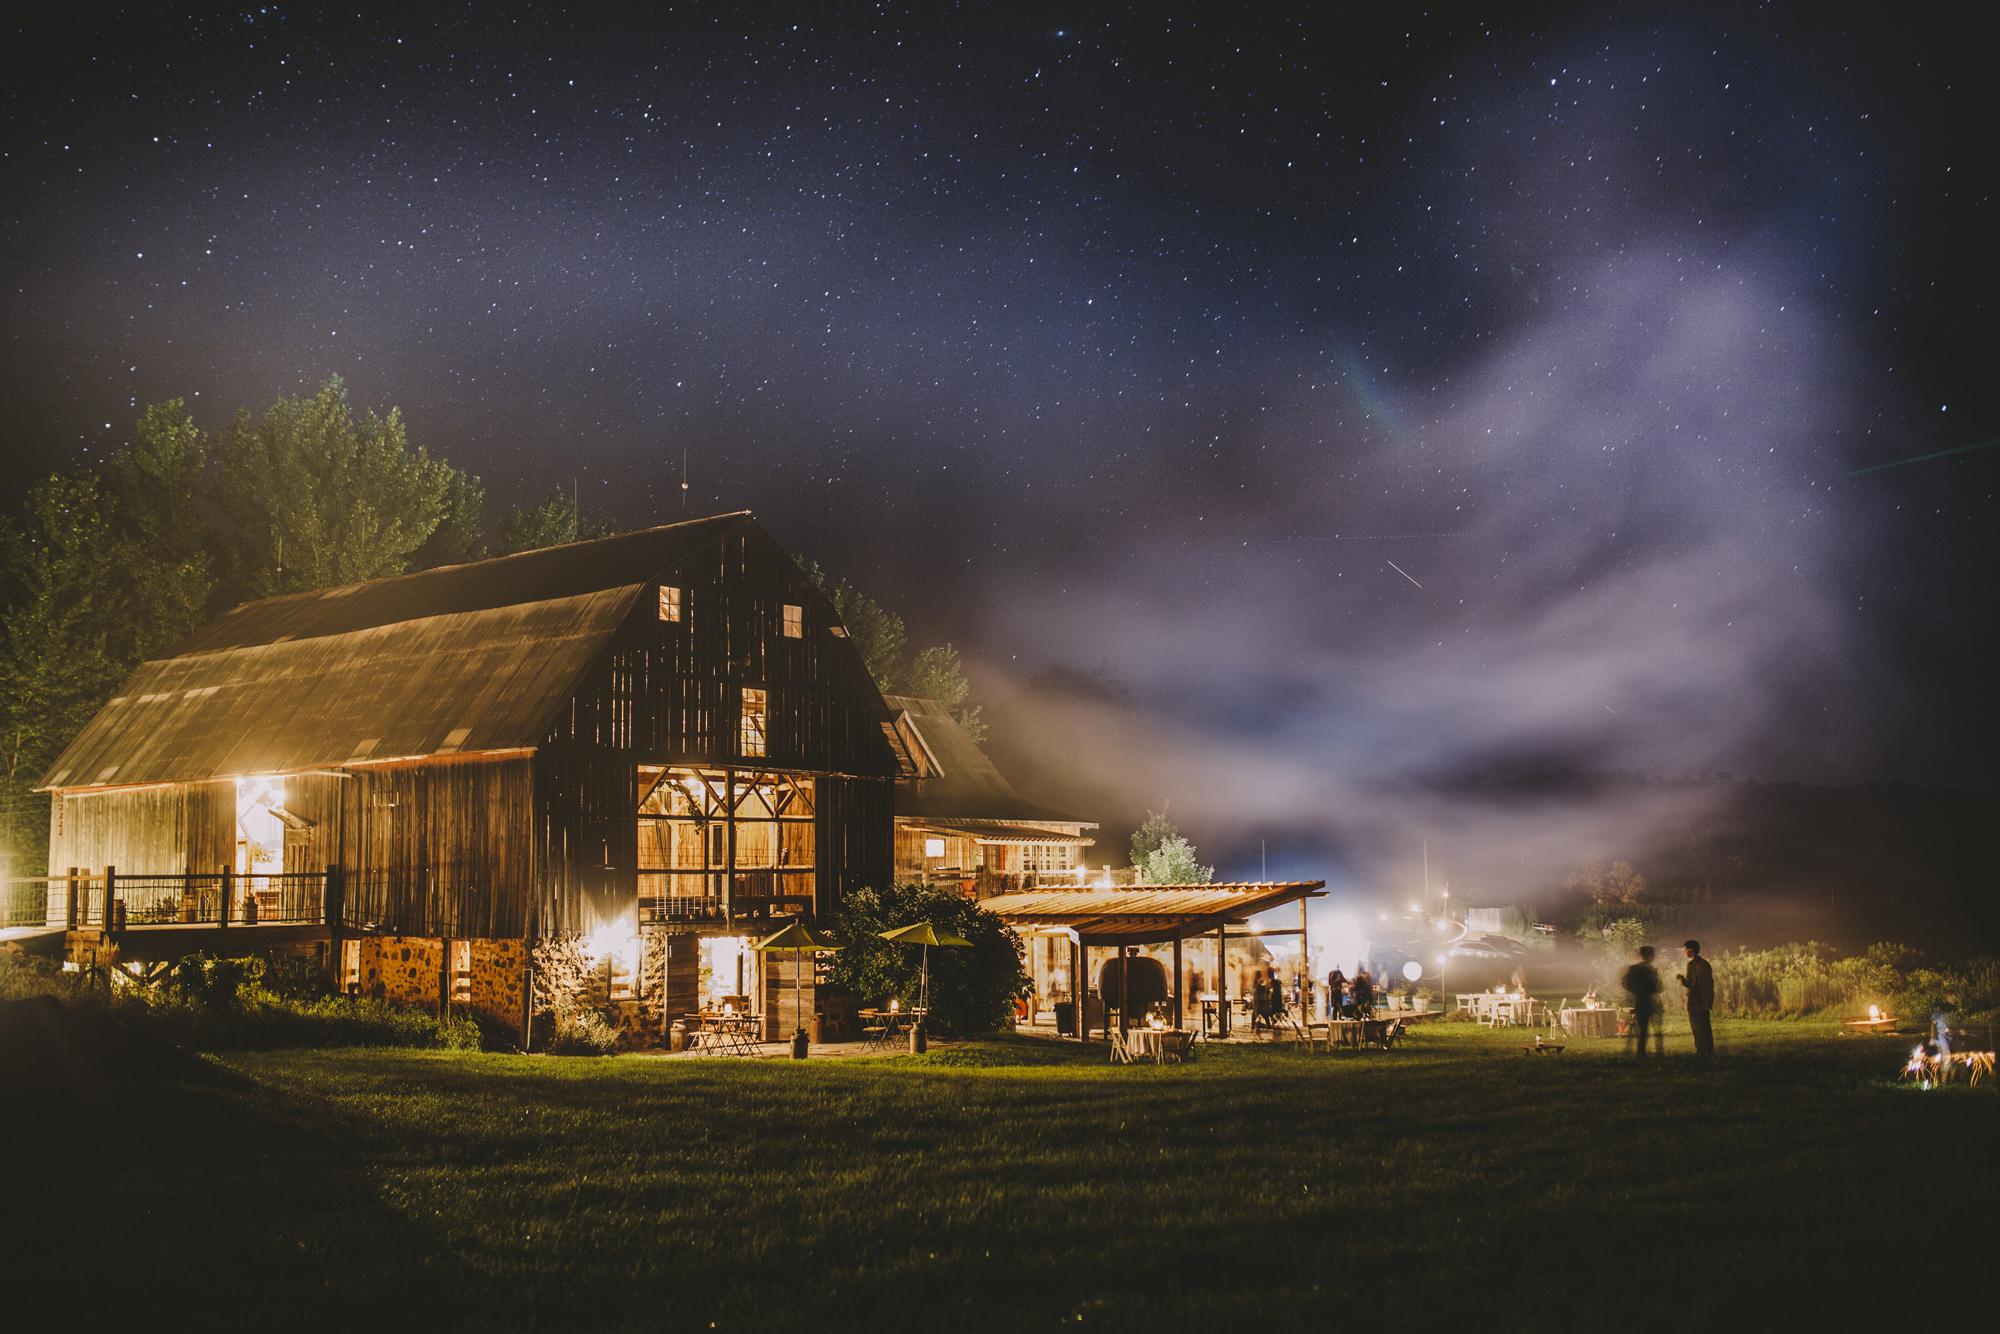 enchanted barn Brandon werth wisconsin wedding photographer outdoor reception